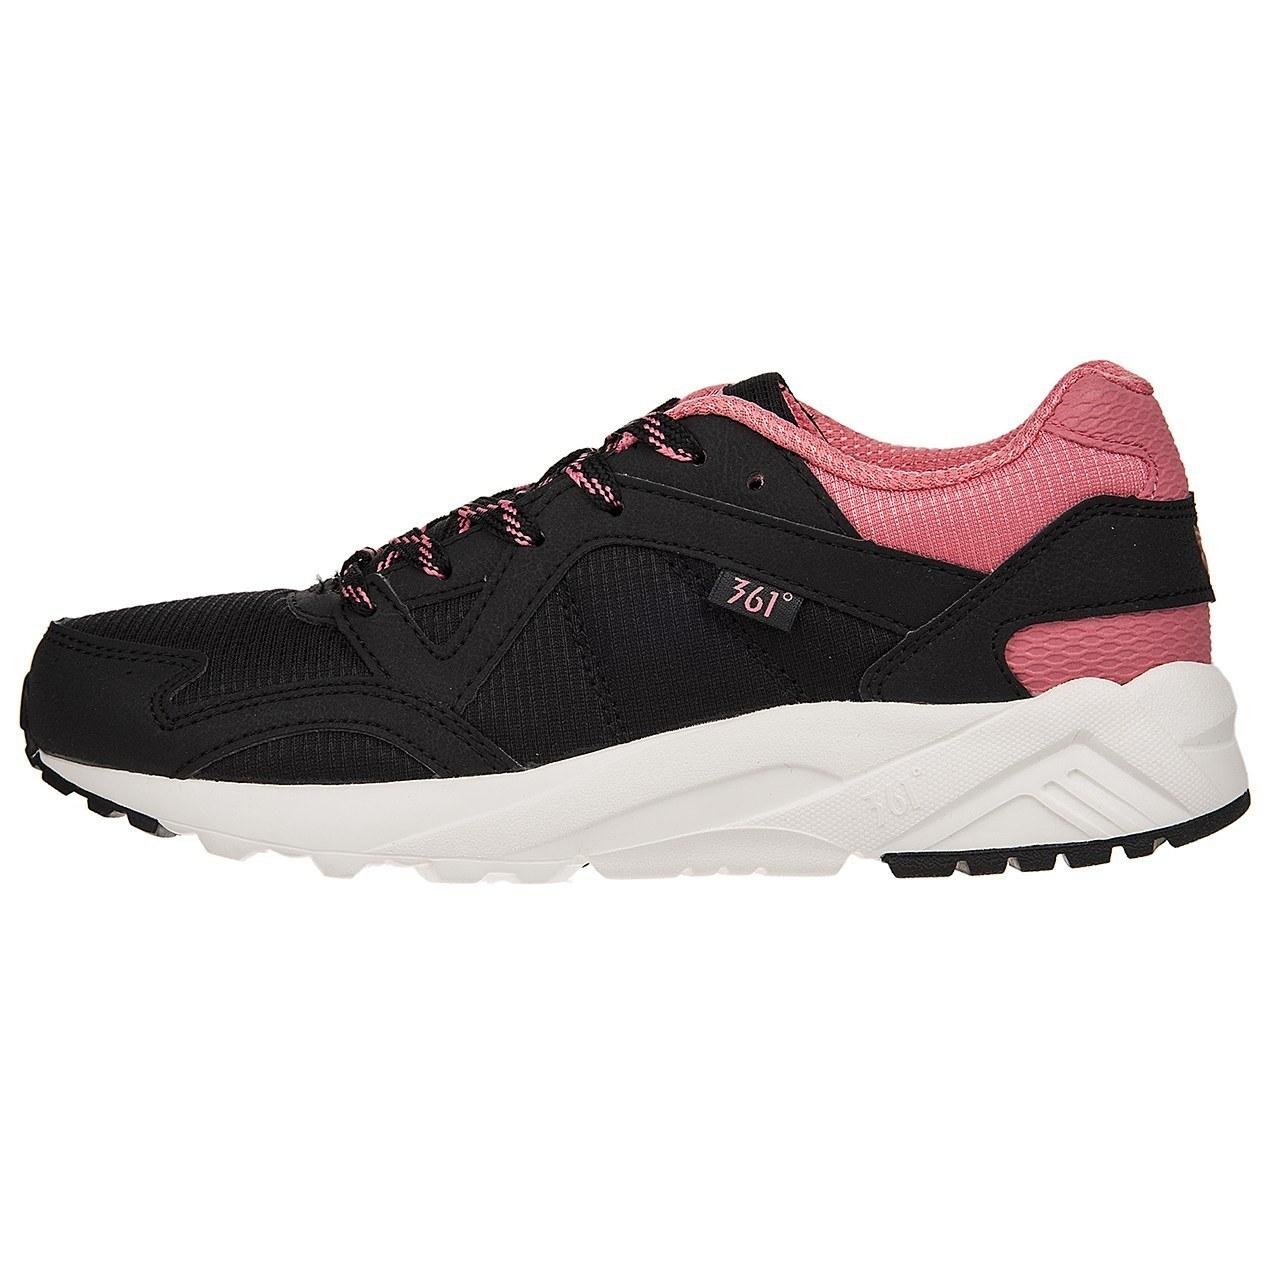 کفش مخصوص دويدن زنانه 361 درجه مدل 1058 | Model 1058 Running Shoes For Women By 361 Degrees